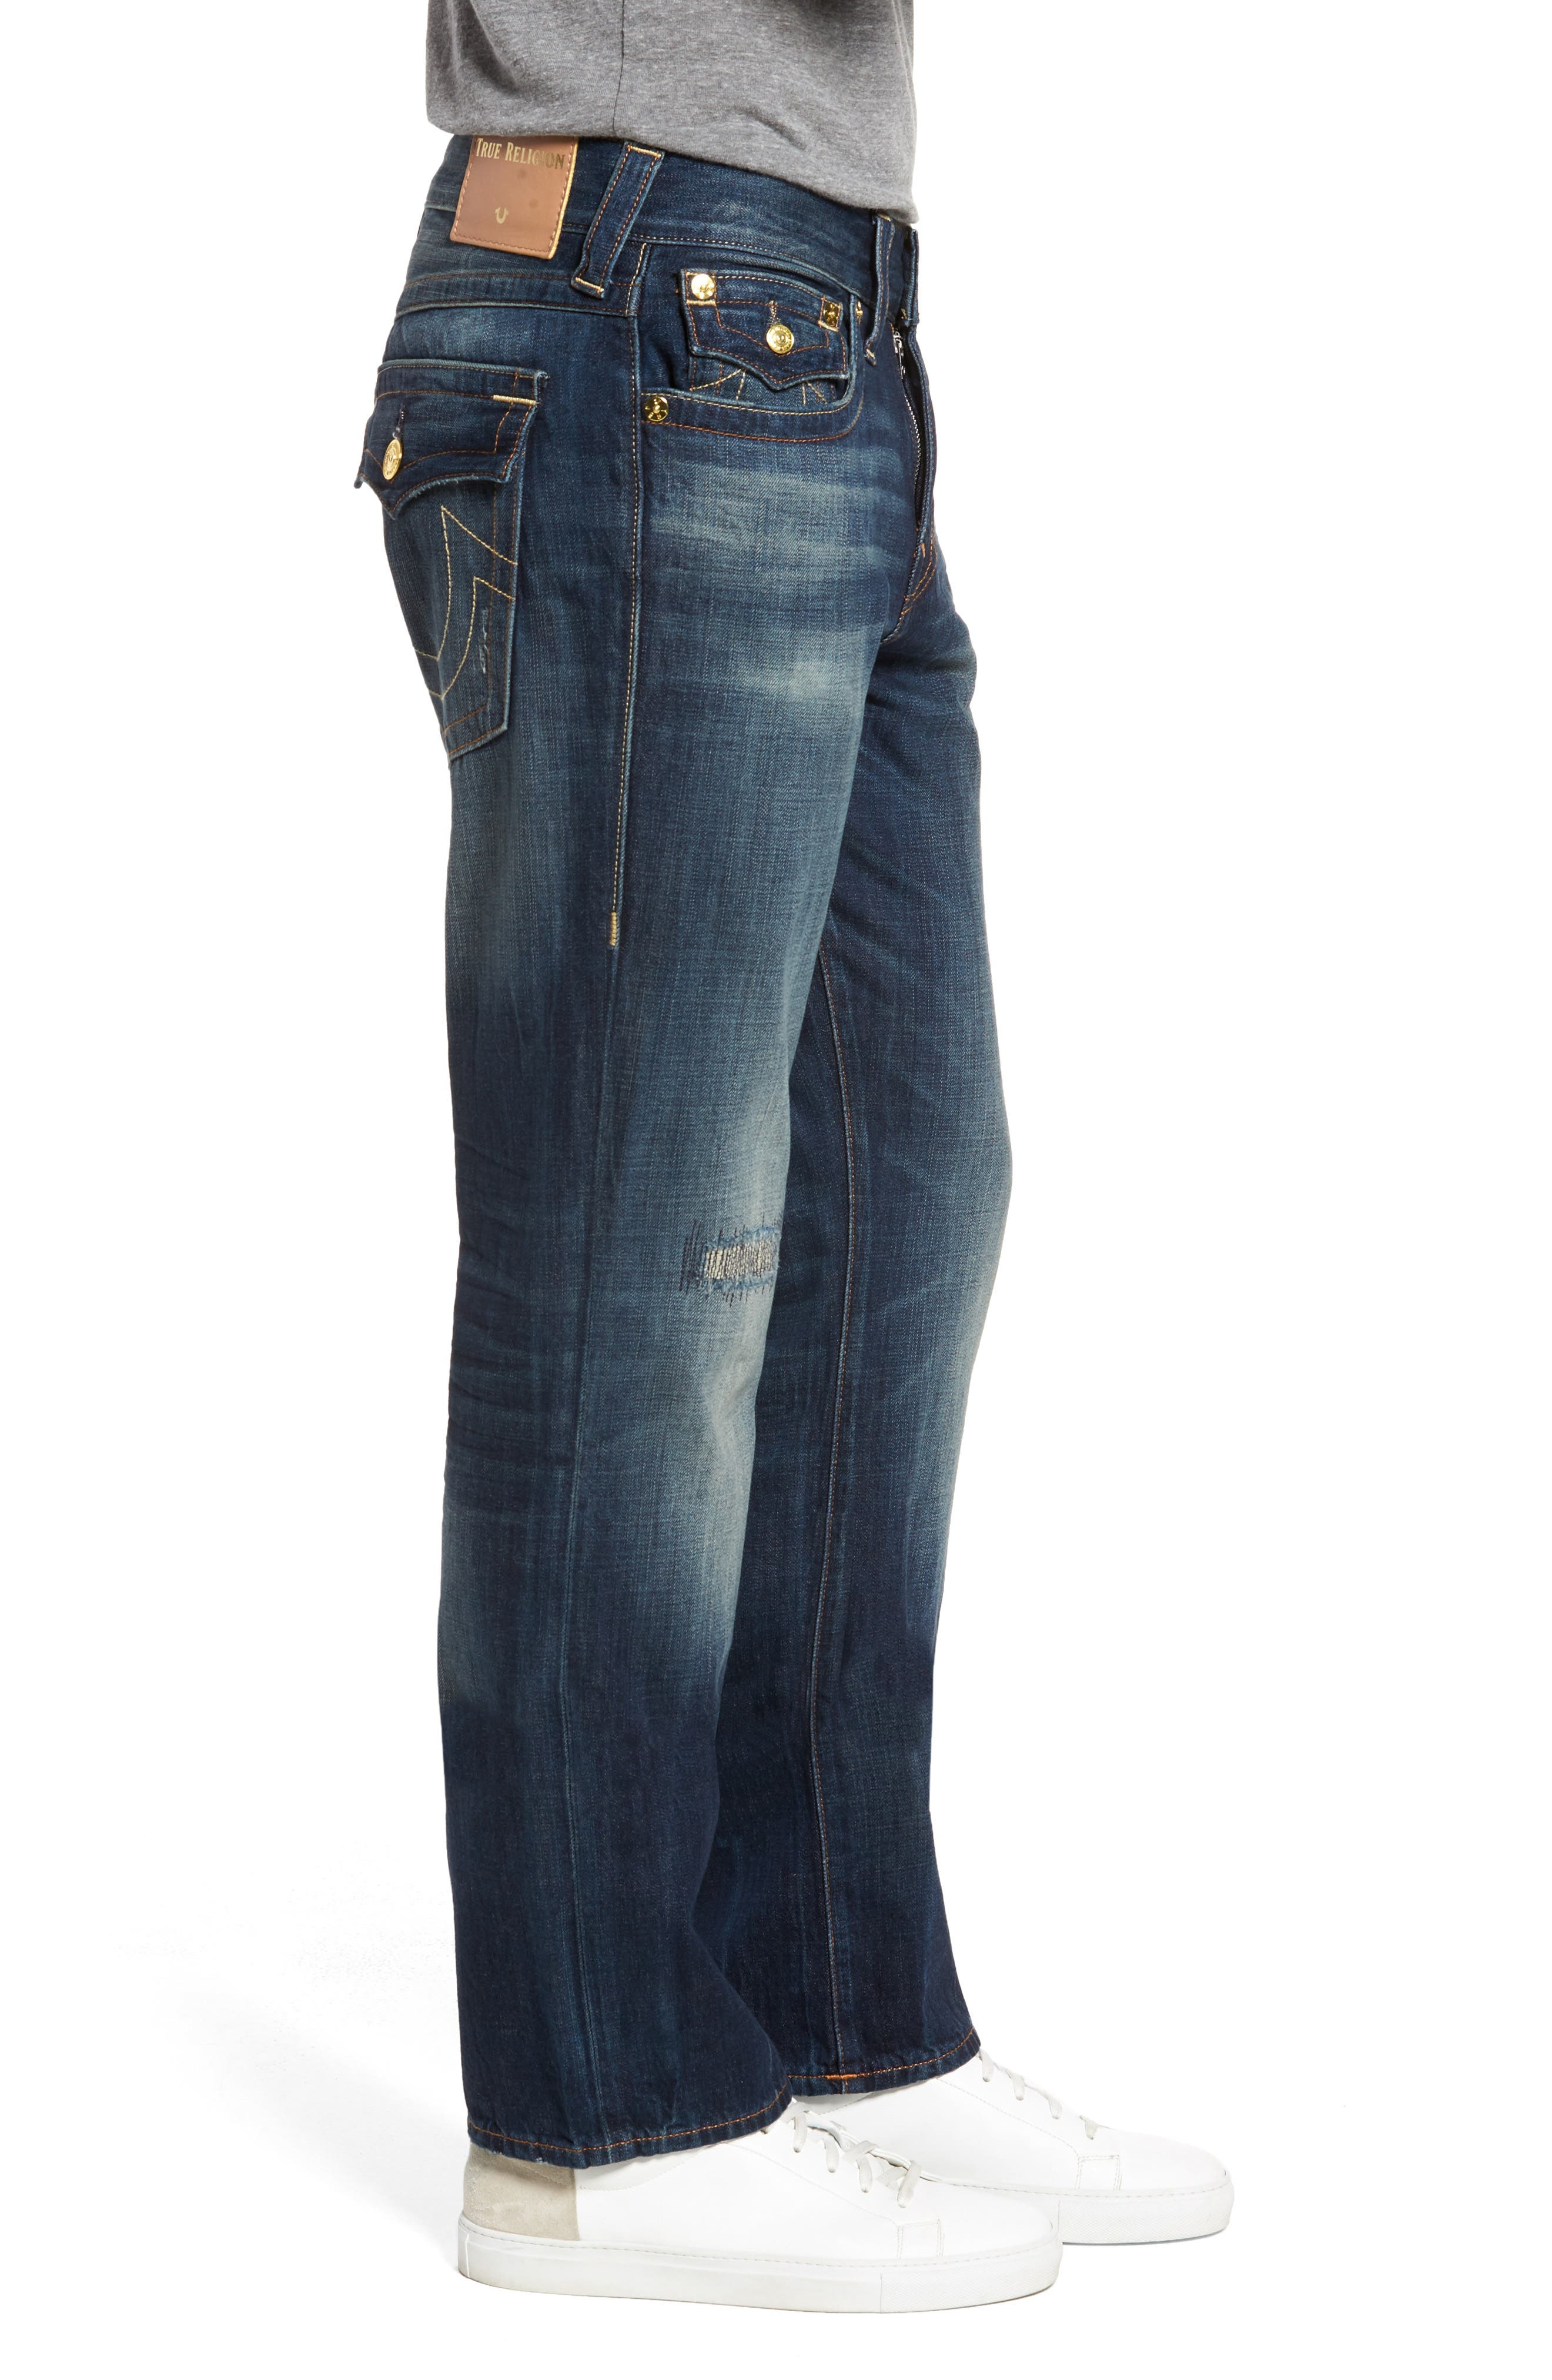 Alternate Image 3  - True Religion Brand Jeans Geno Straight Leg Jeans (Mended Center Stage)